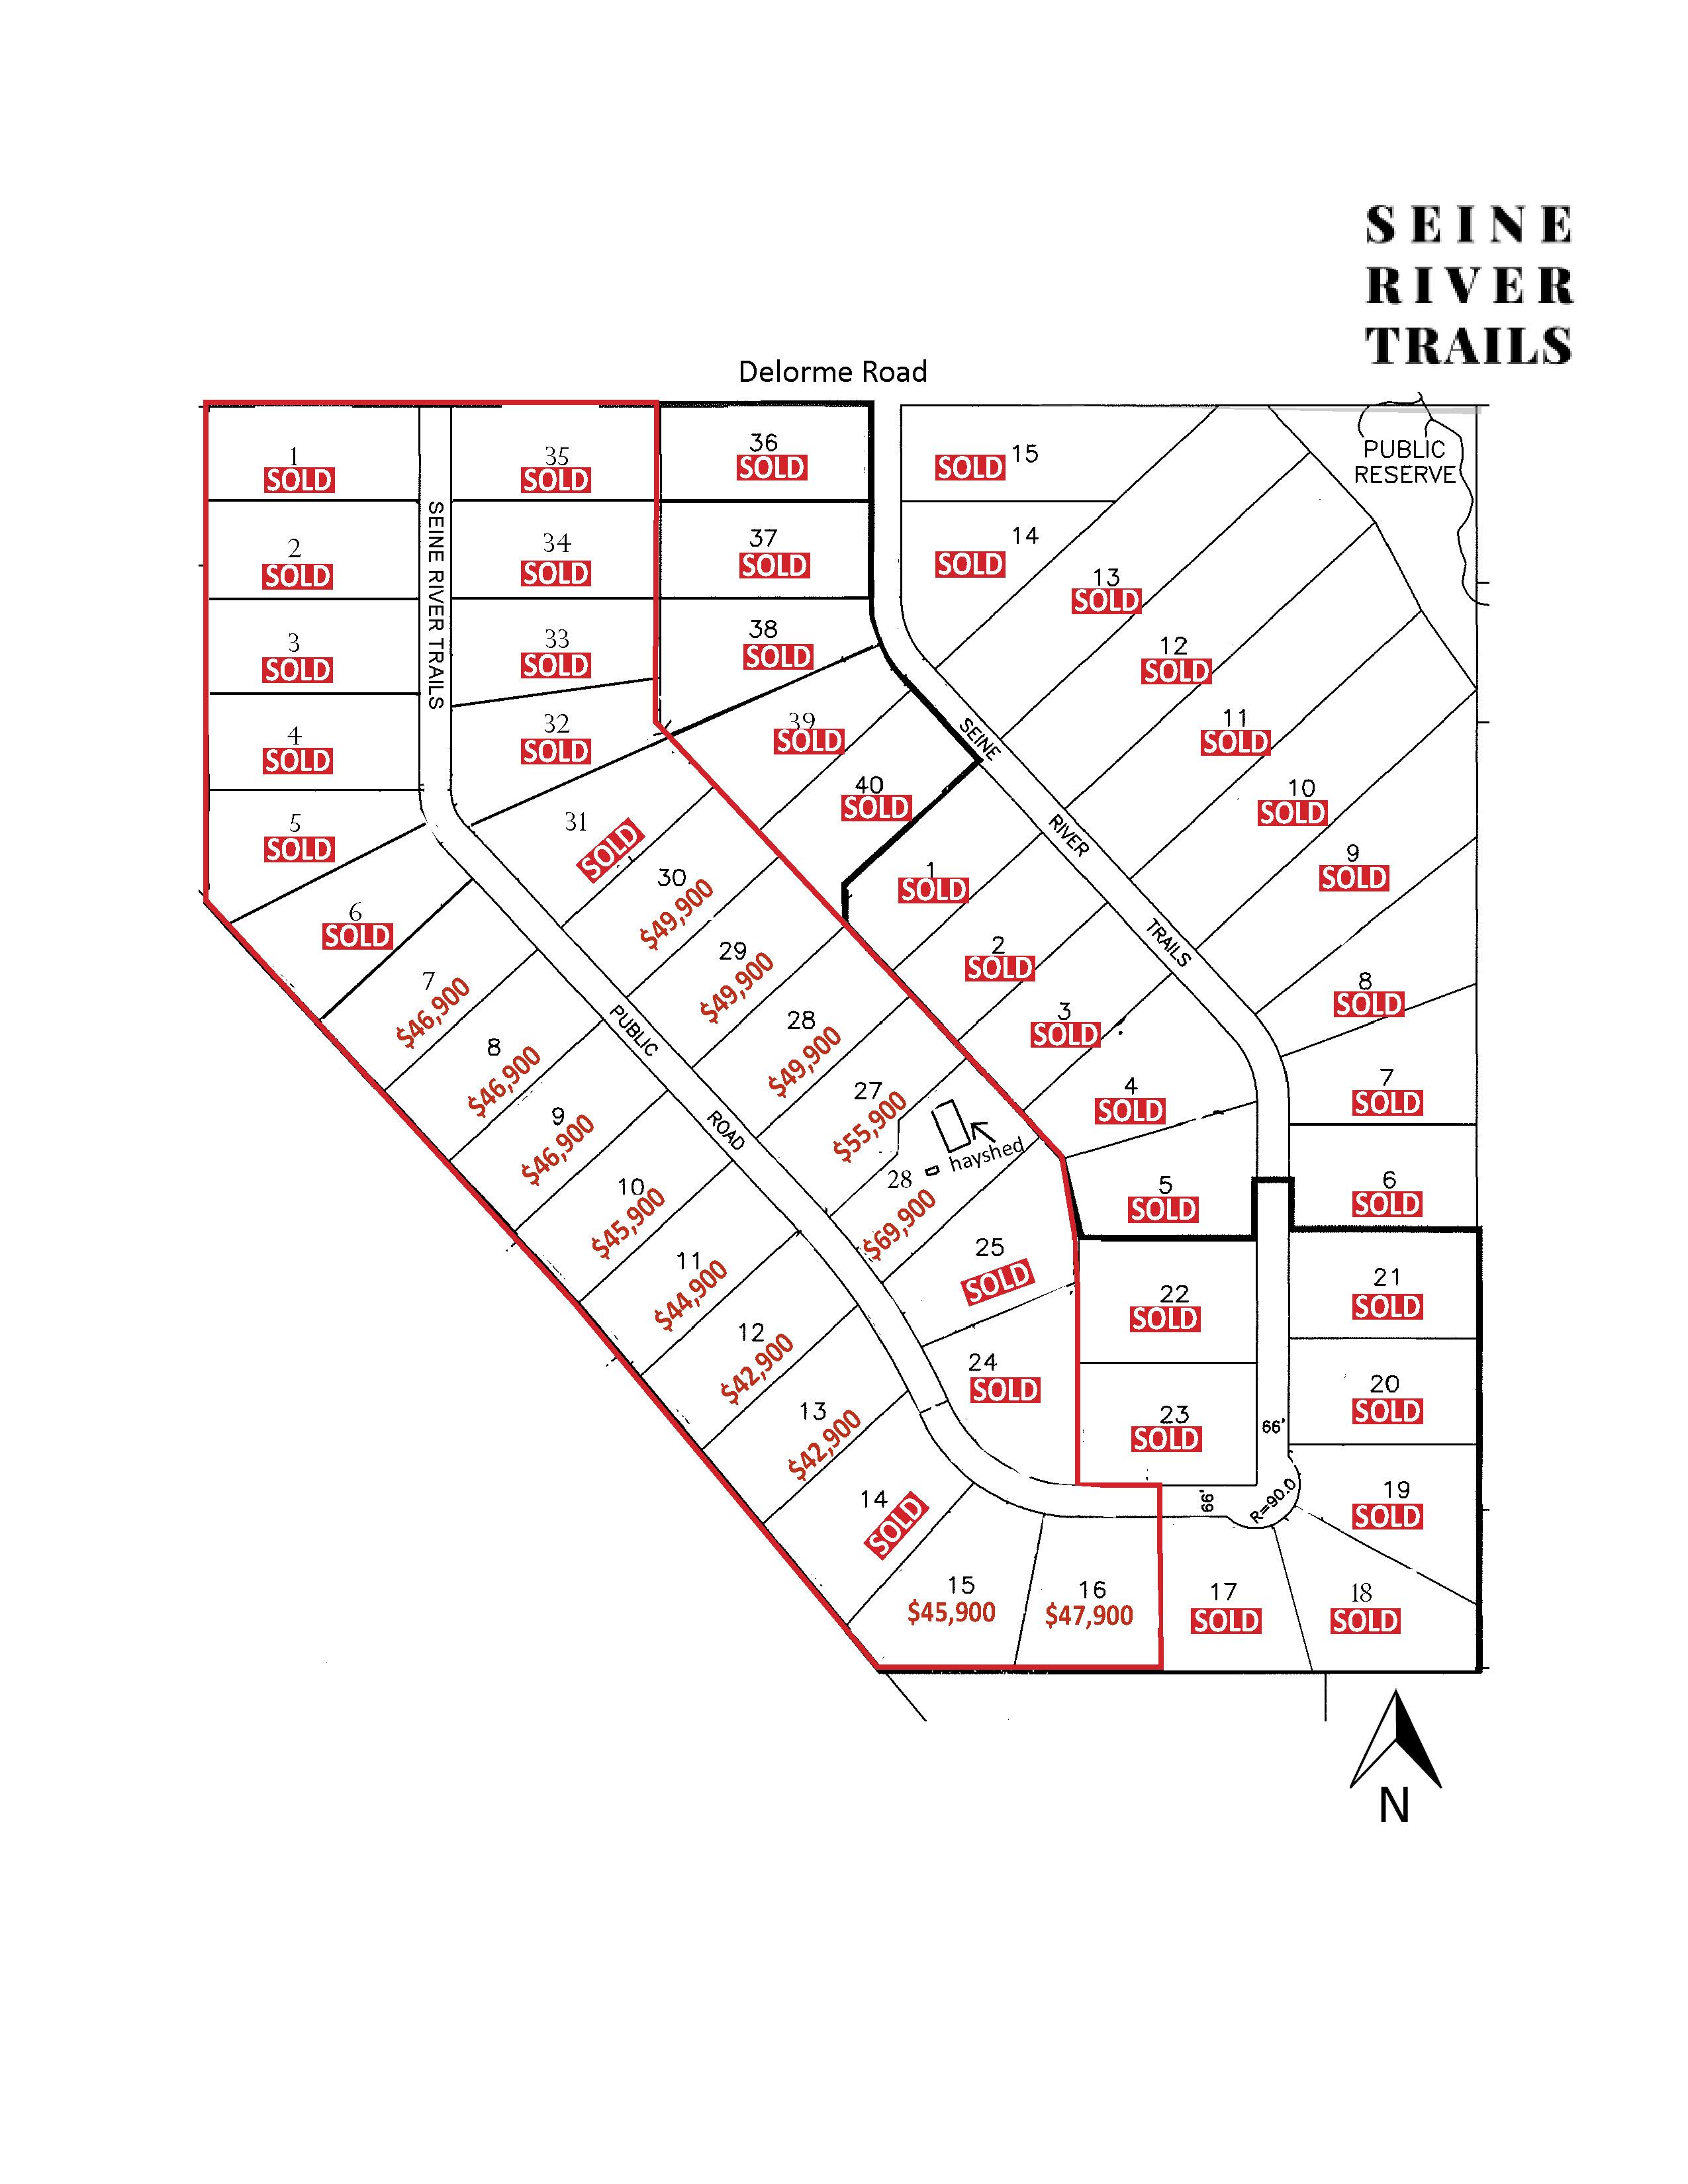 Seine River Trails Development Site Map